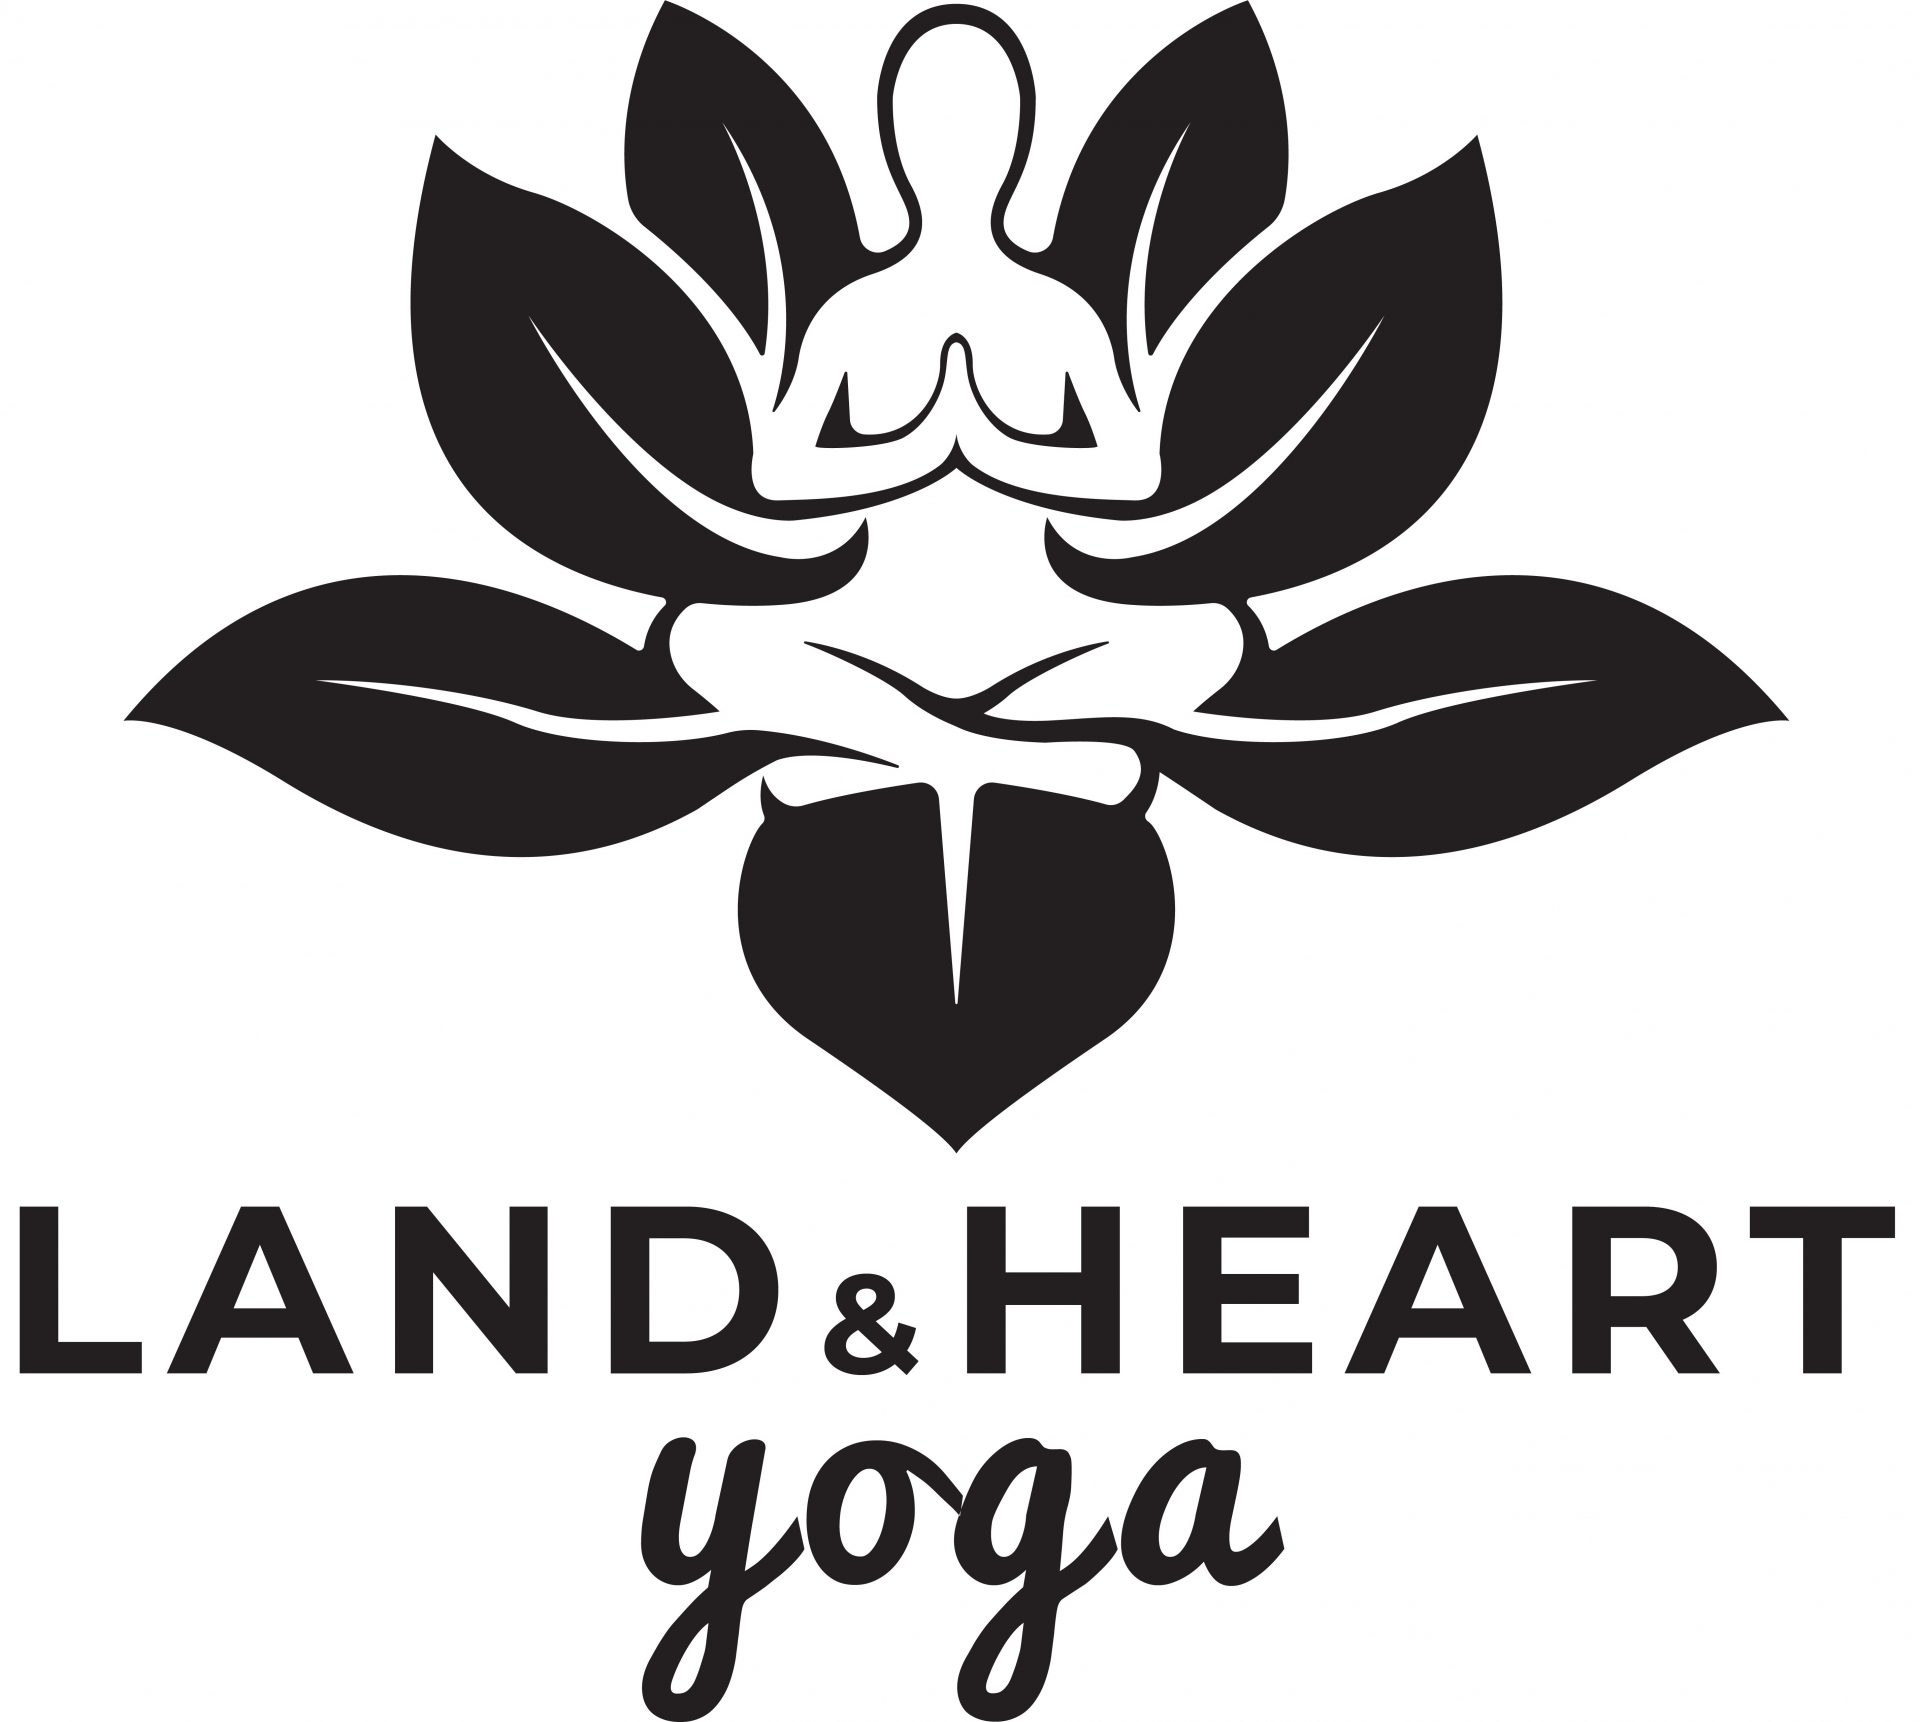 land and heart yoga logo Online Yoga Teacher Training